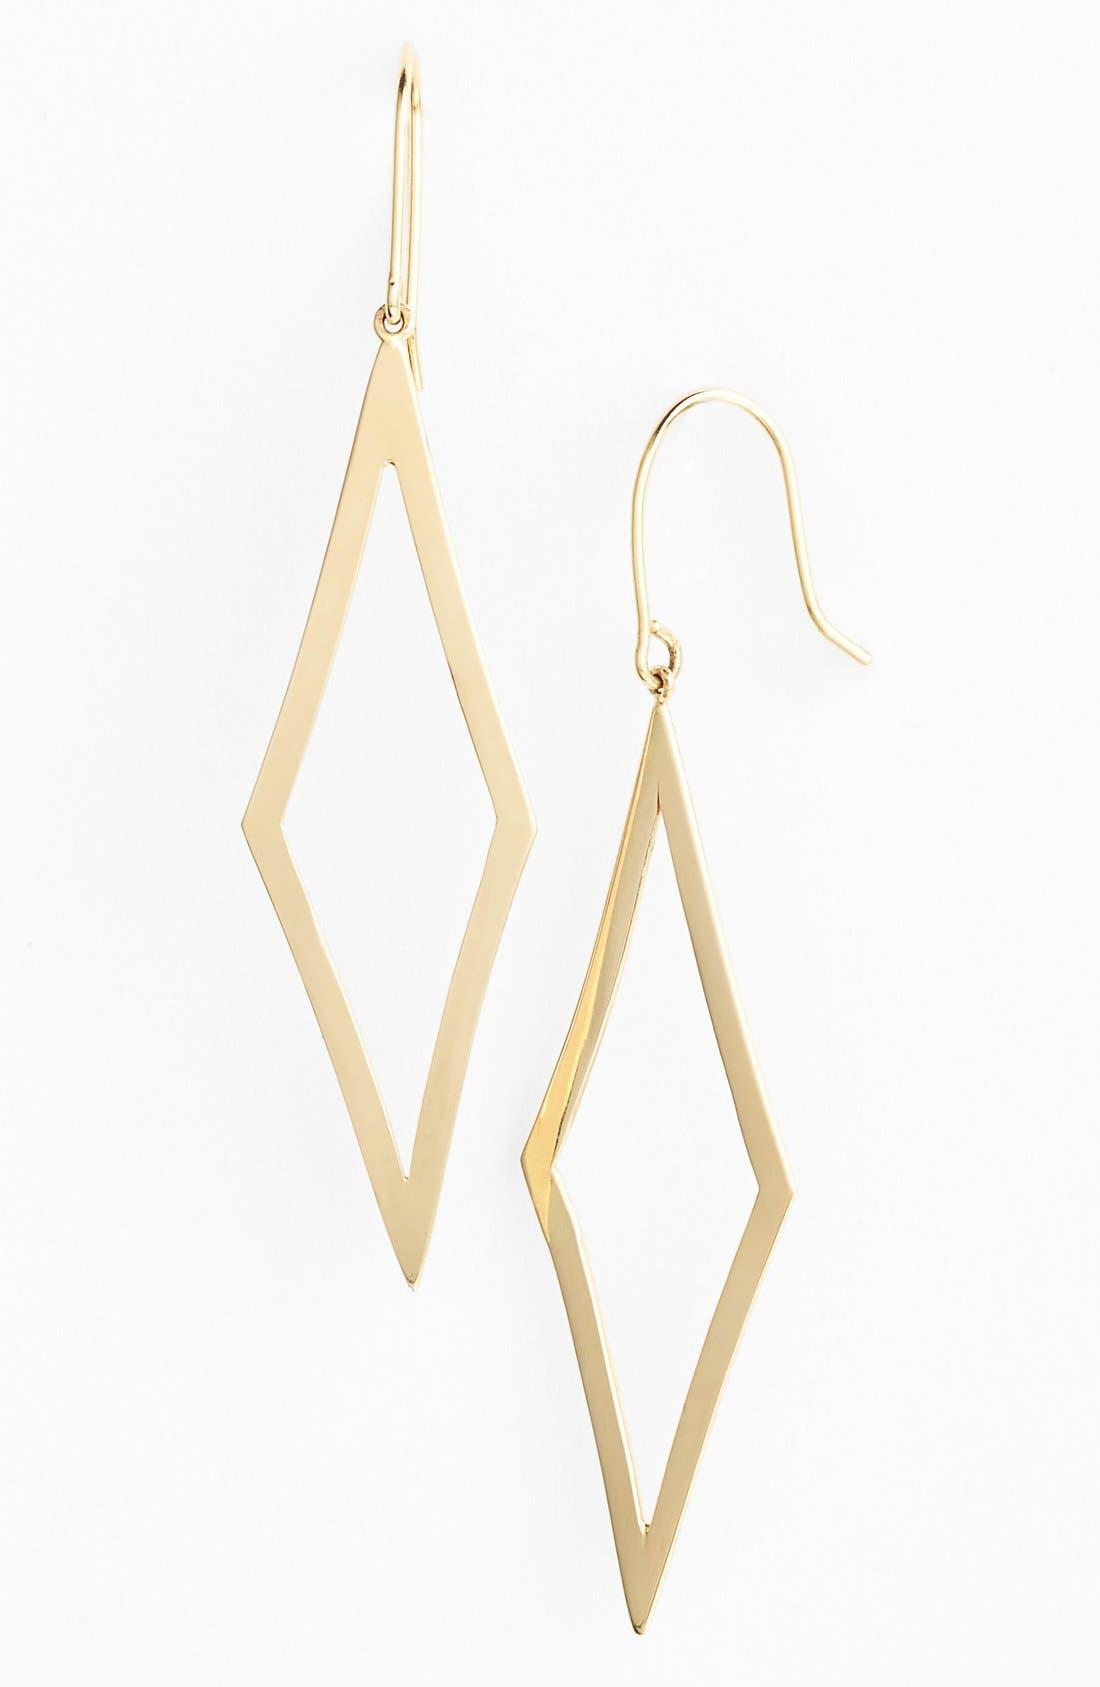 Main Image - Lana Jewelry 'Aura' Small Drop Earrings